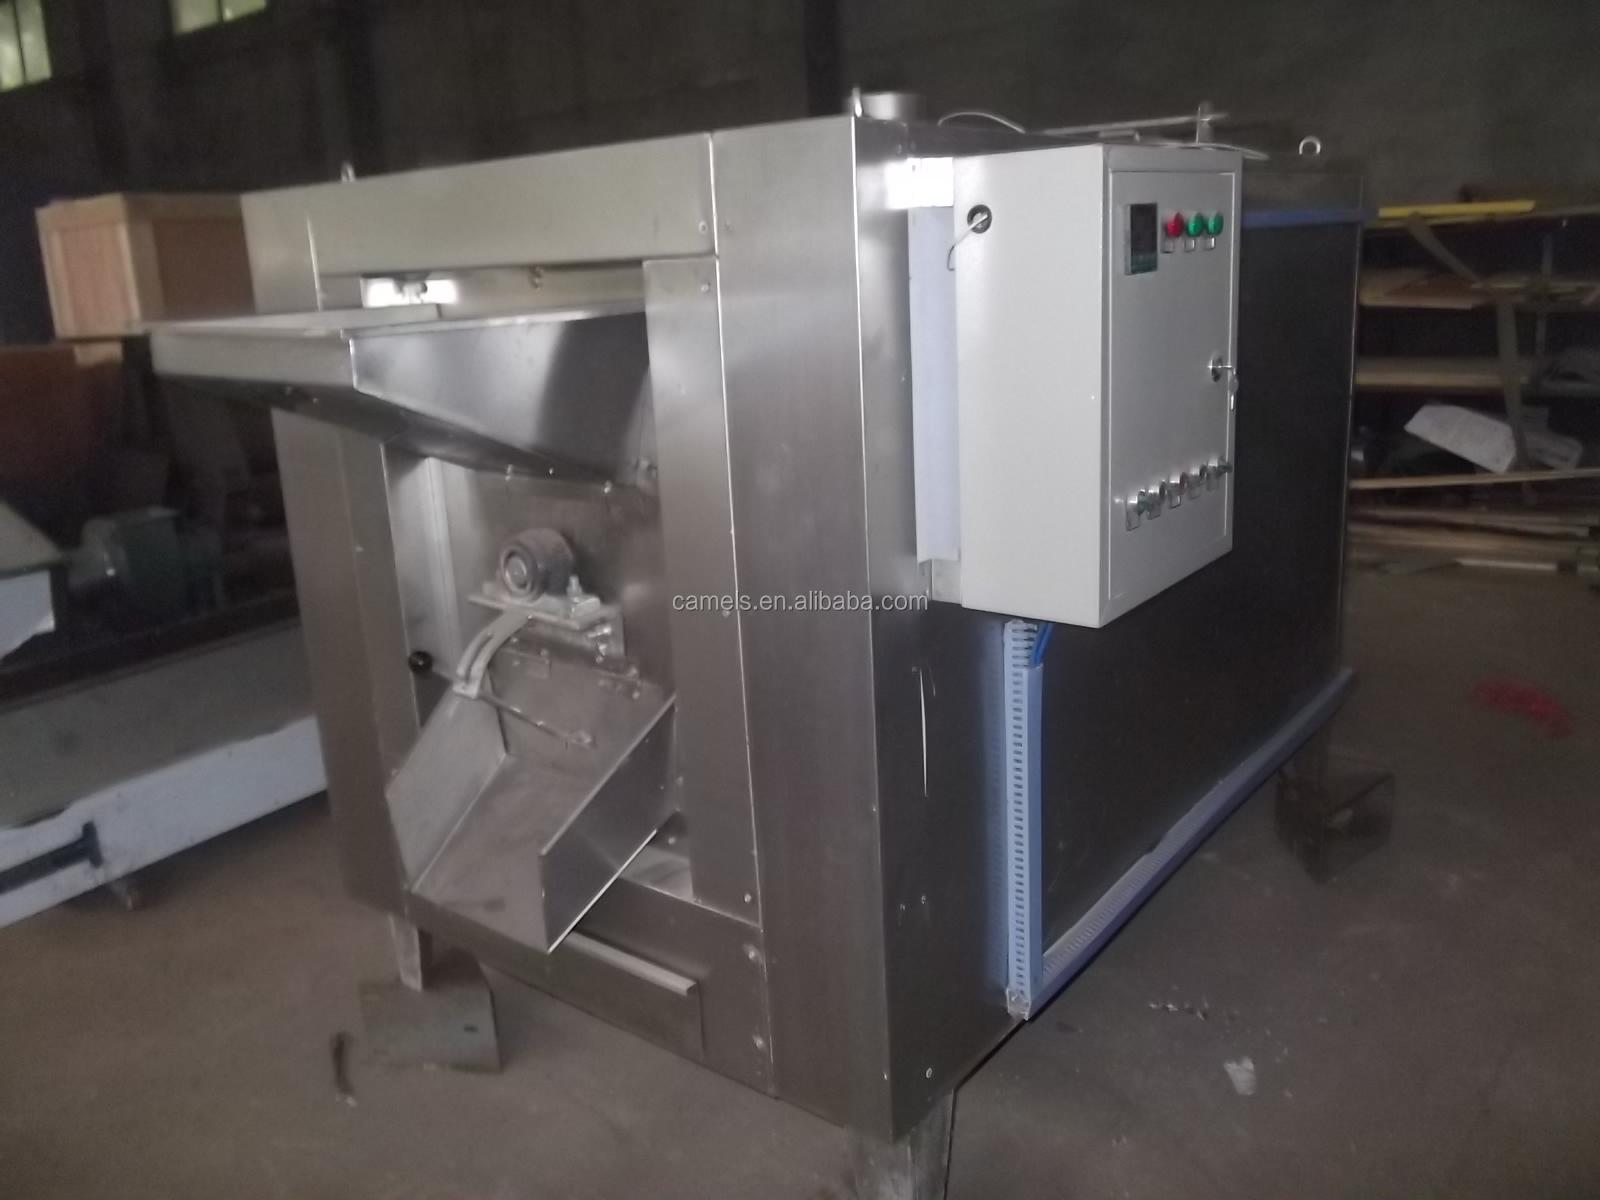 Elektrische Koffiebrander Verwarmingselement Commerciële Pinda Koffiebrander Rotary Drum Moer Koffiebrander